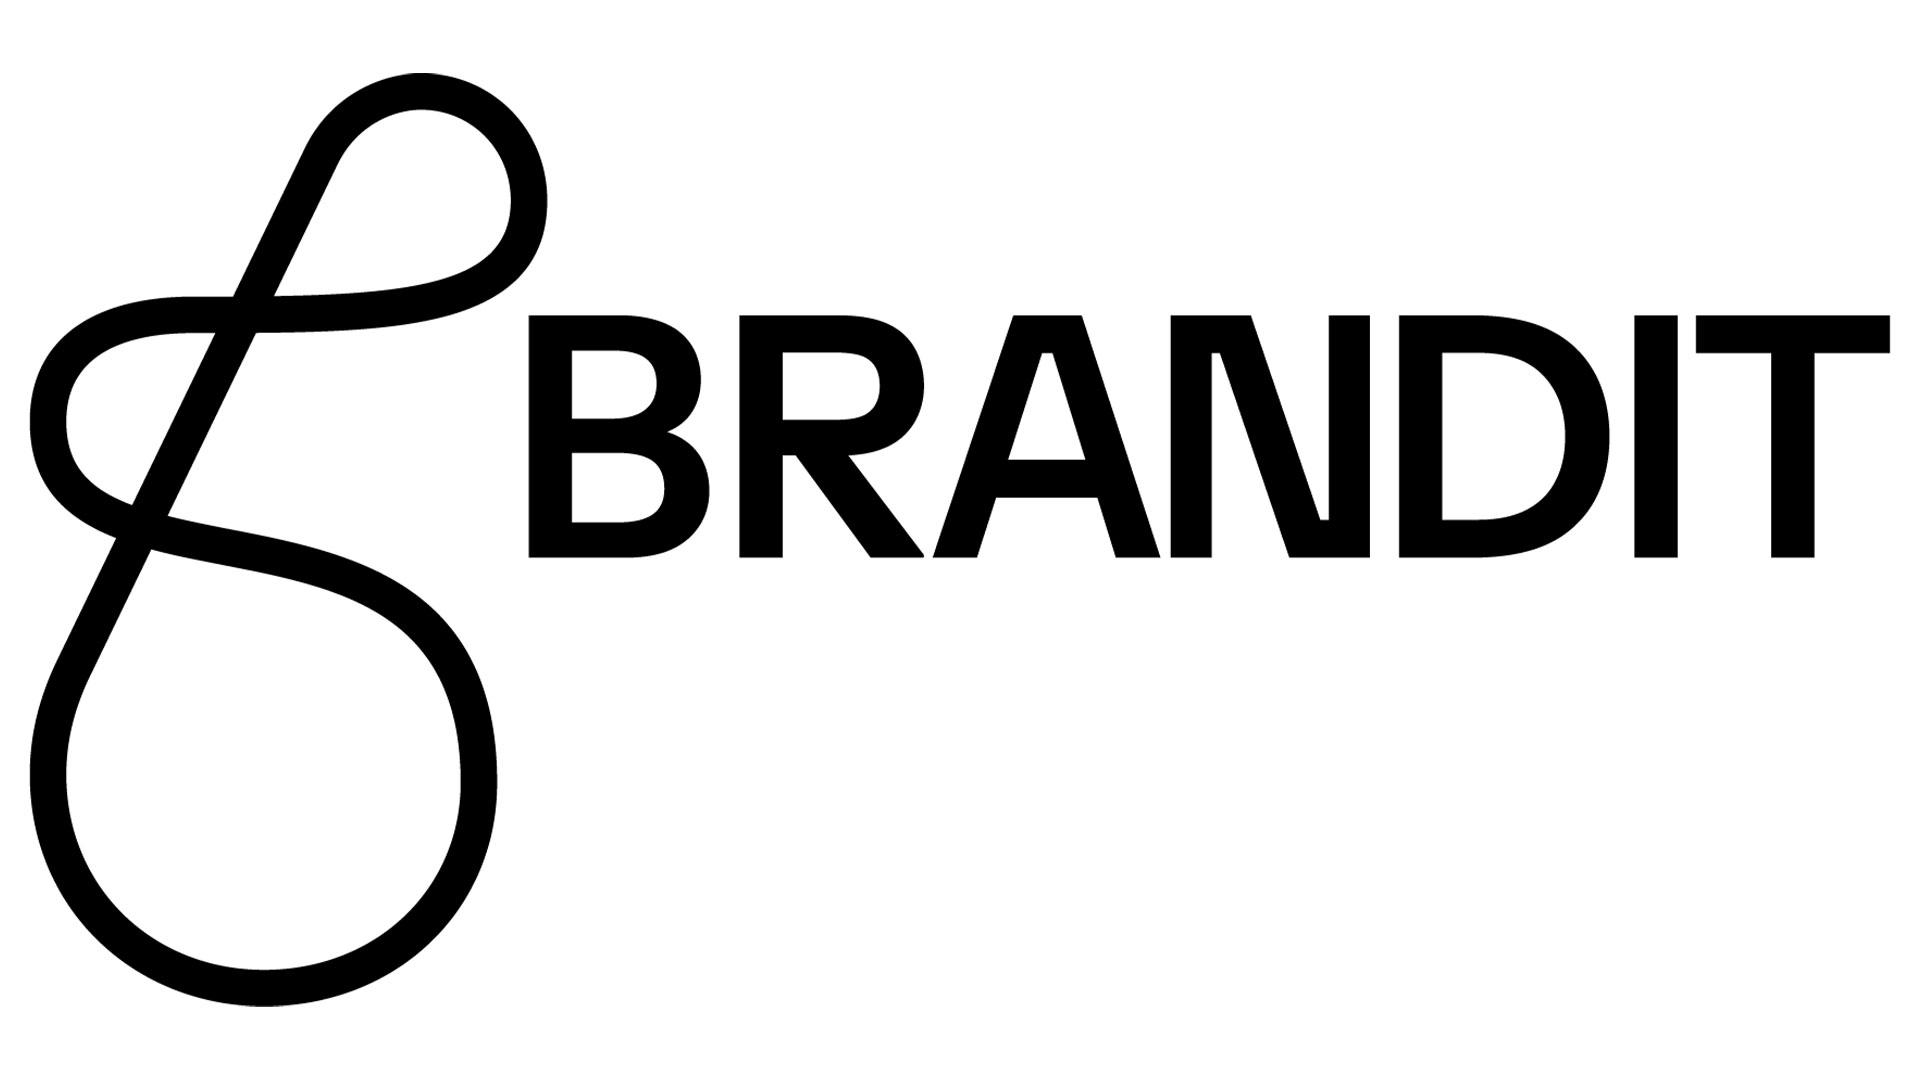 Branditlogo